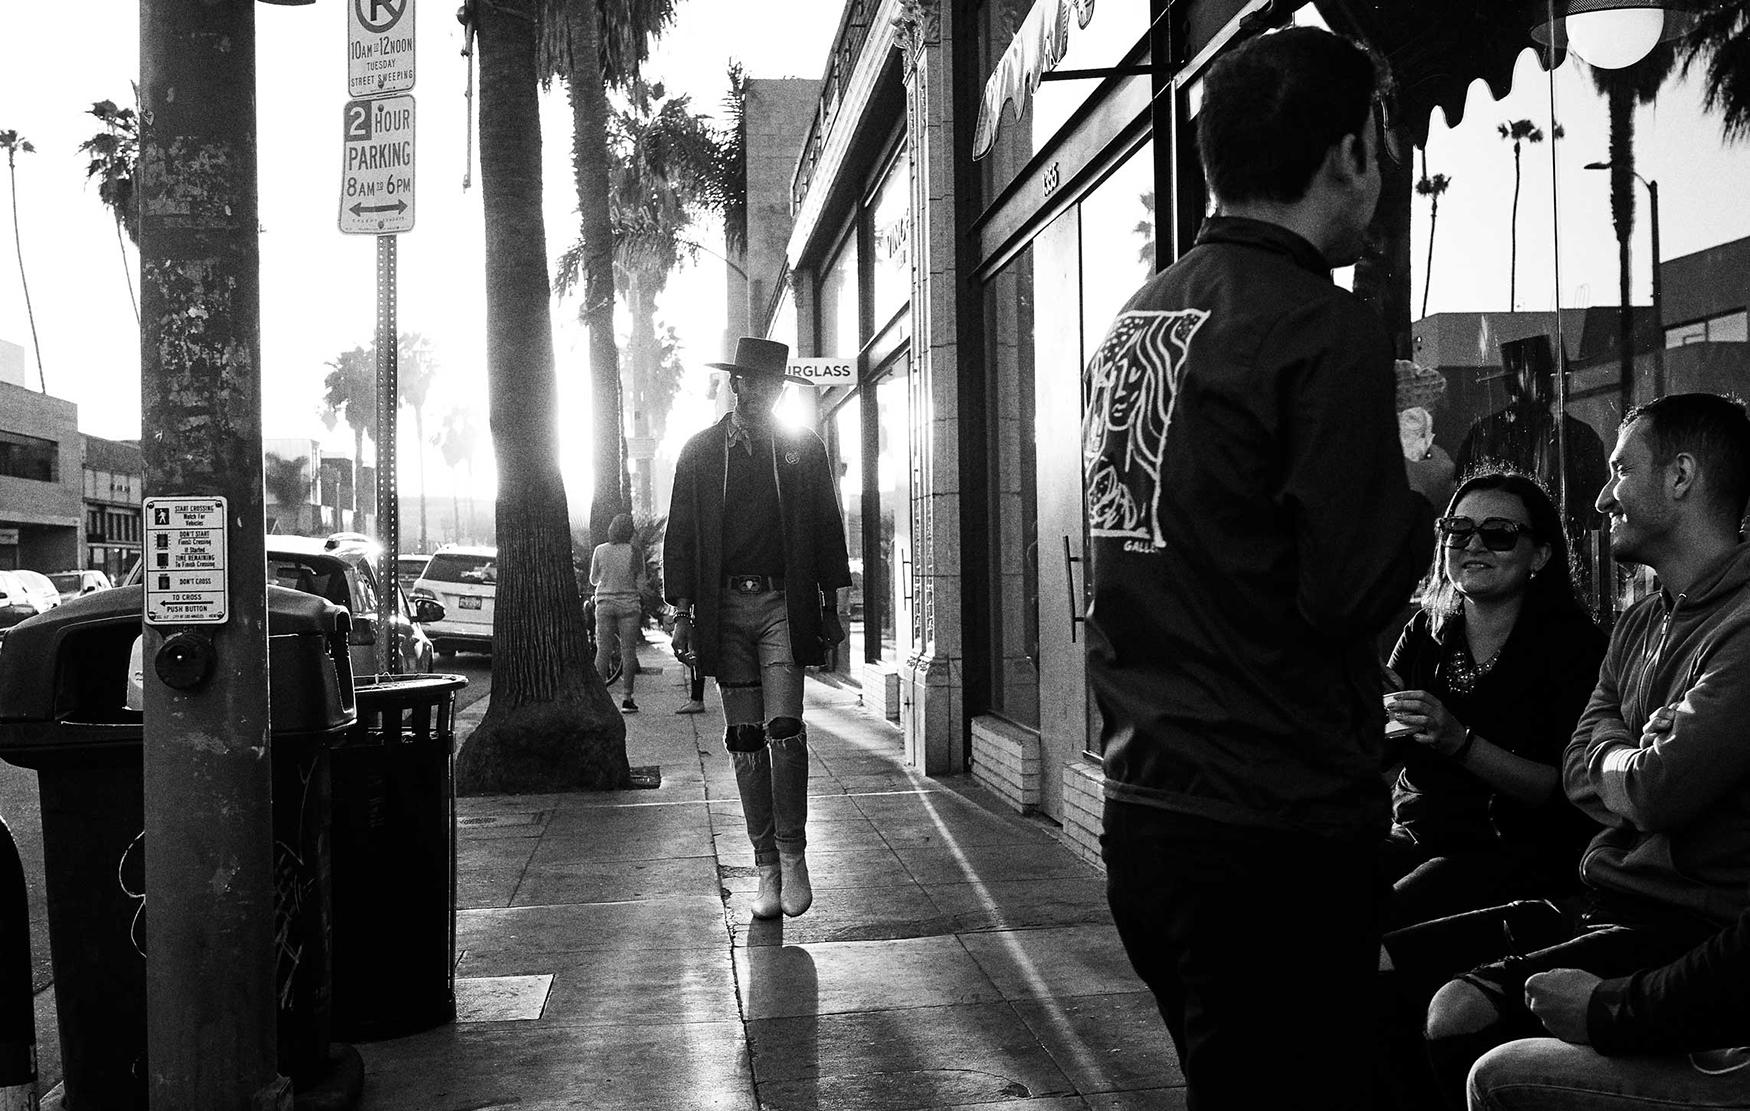 michael-scott-slosar-power-LA-street-story-emmett-skyy-82-2018-016.jpg